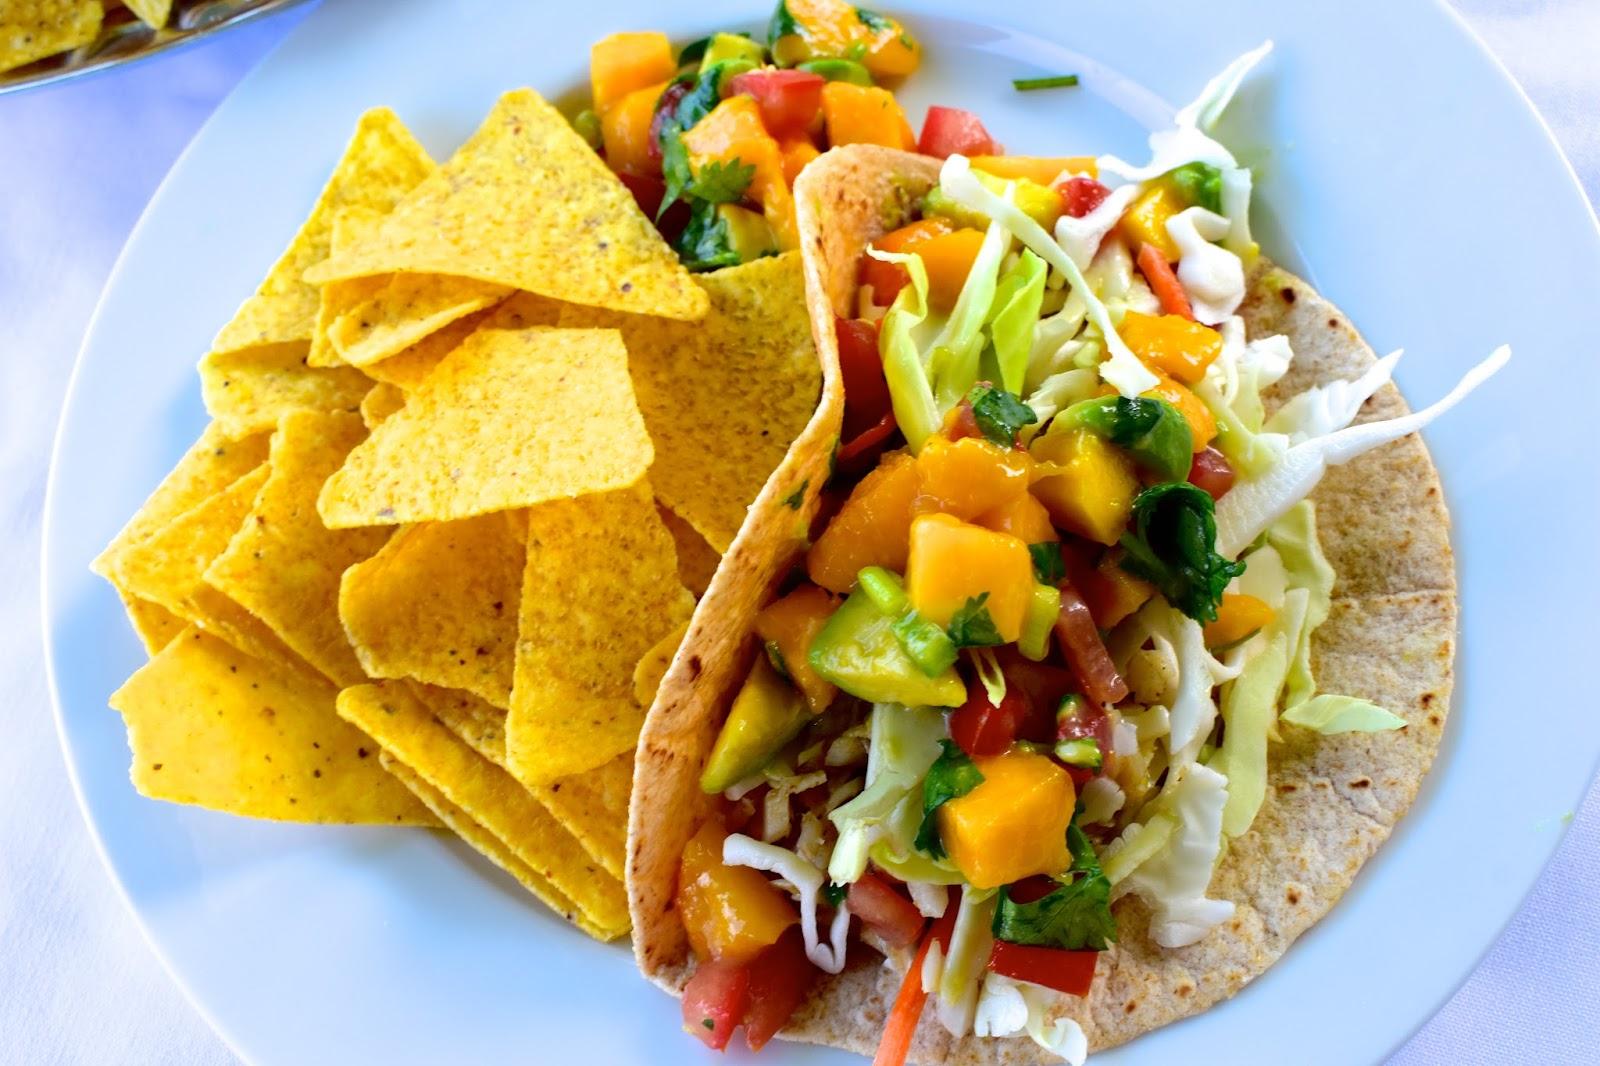 Tilapia Tacos with Fresh Peach Salsa - My Own Meal Plan